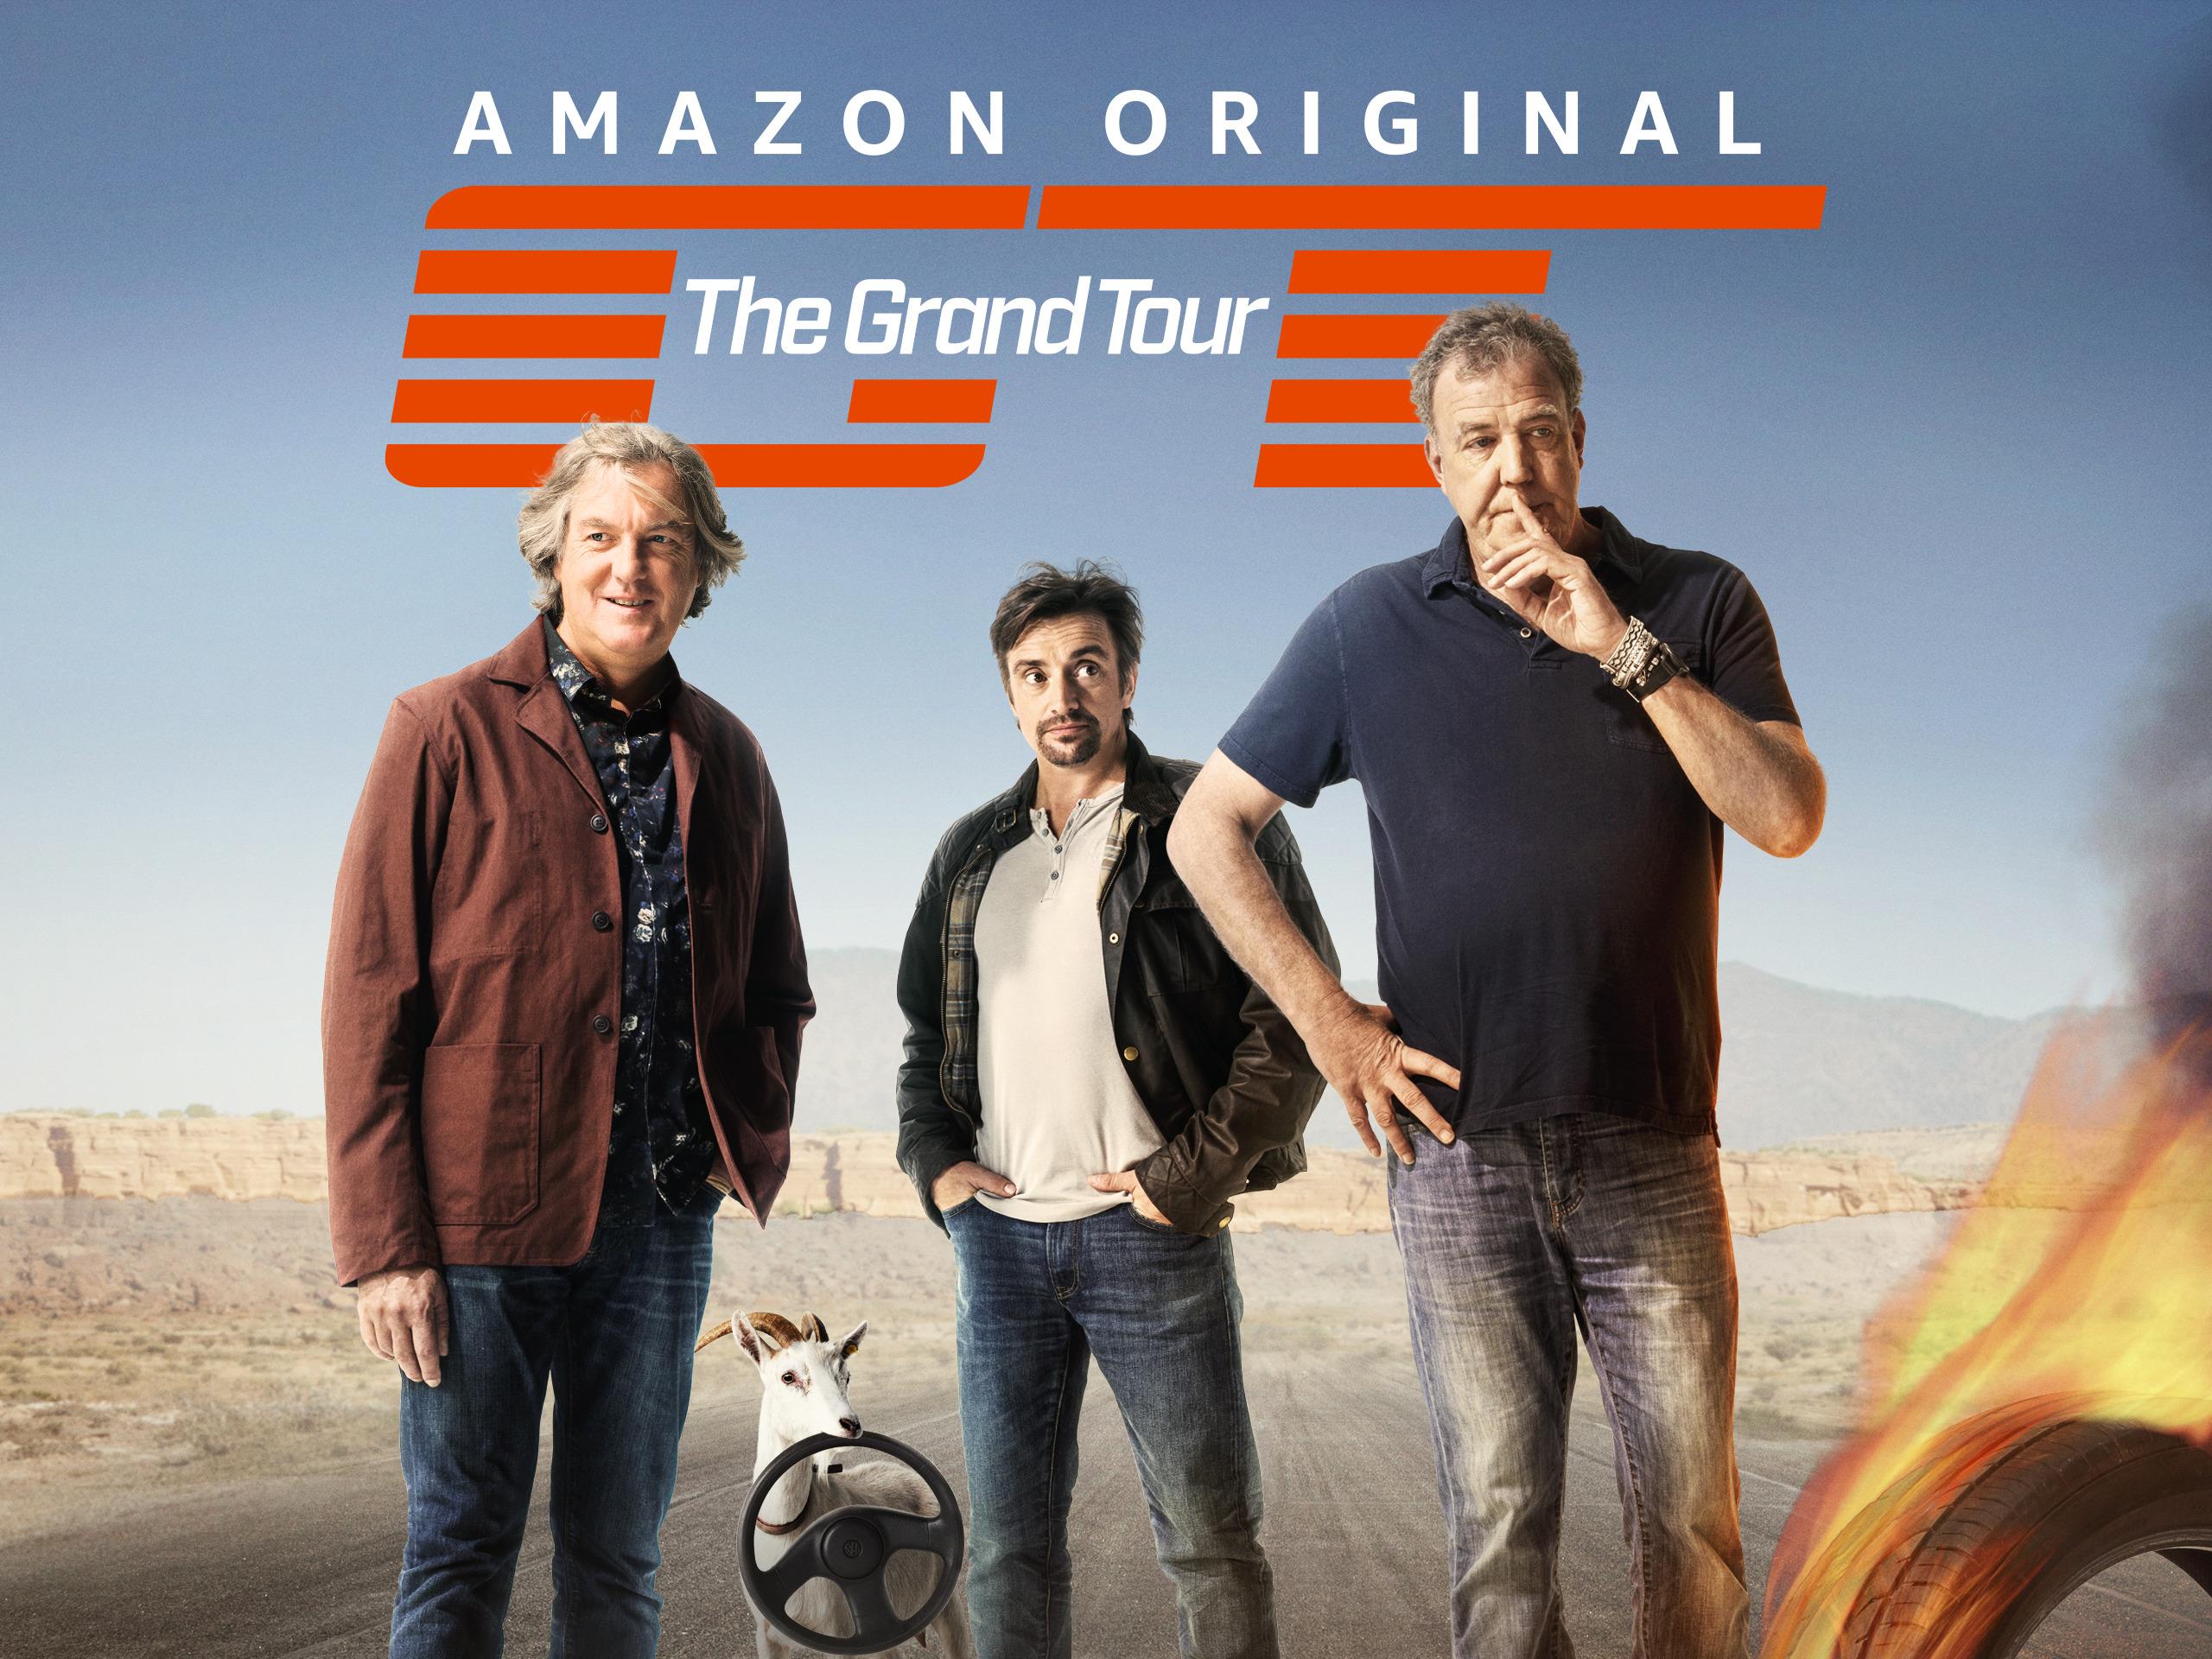 the grand tour season 3 episode 6 free download